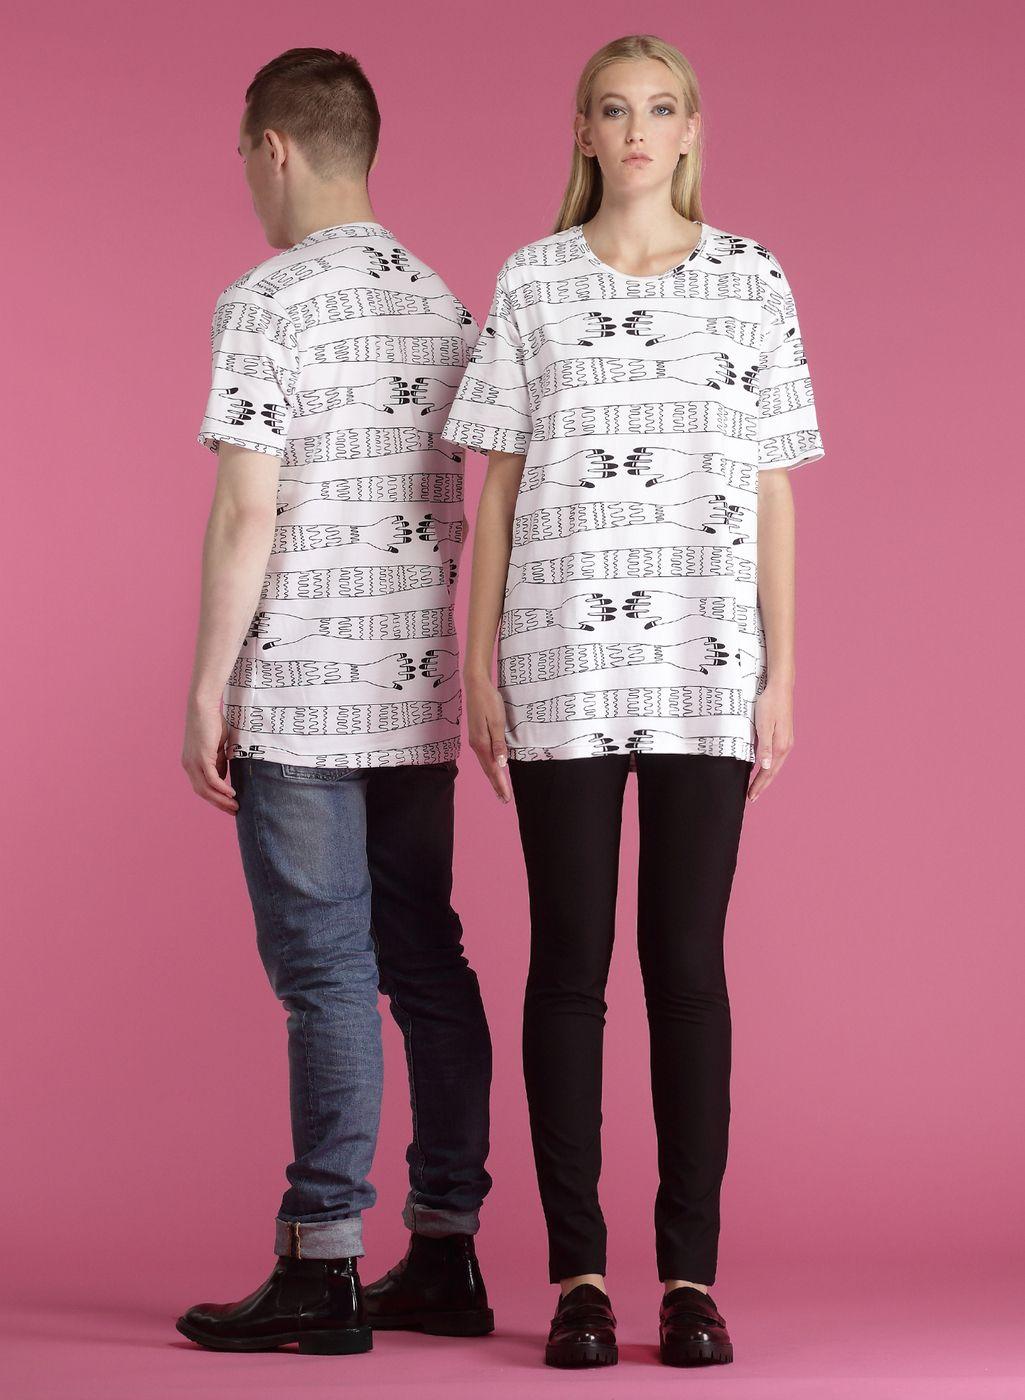 HUGS_Tshirt_unisex.jpg